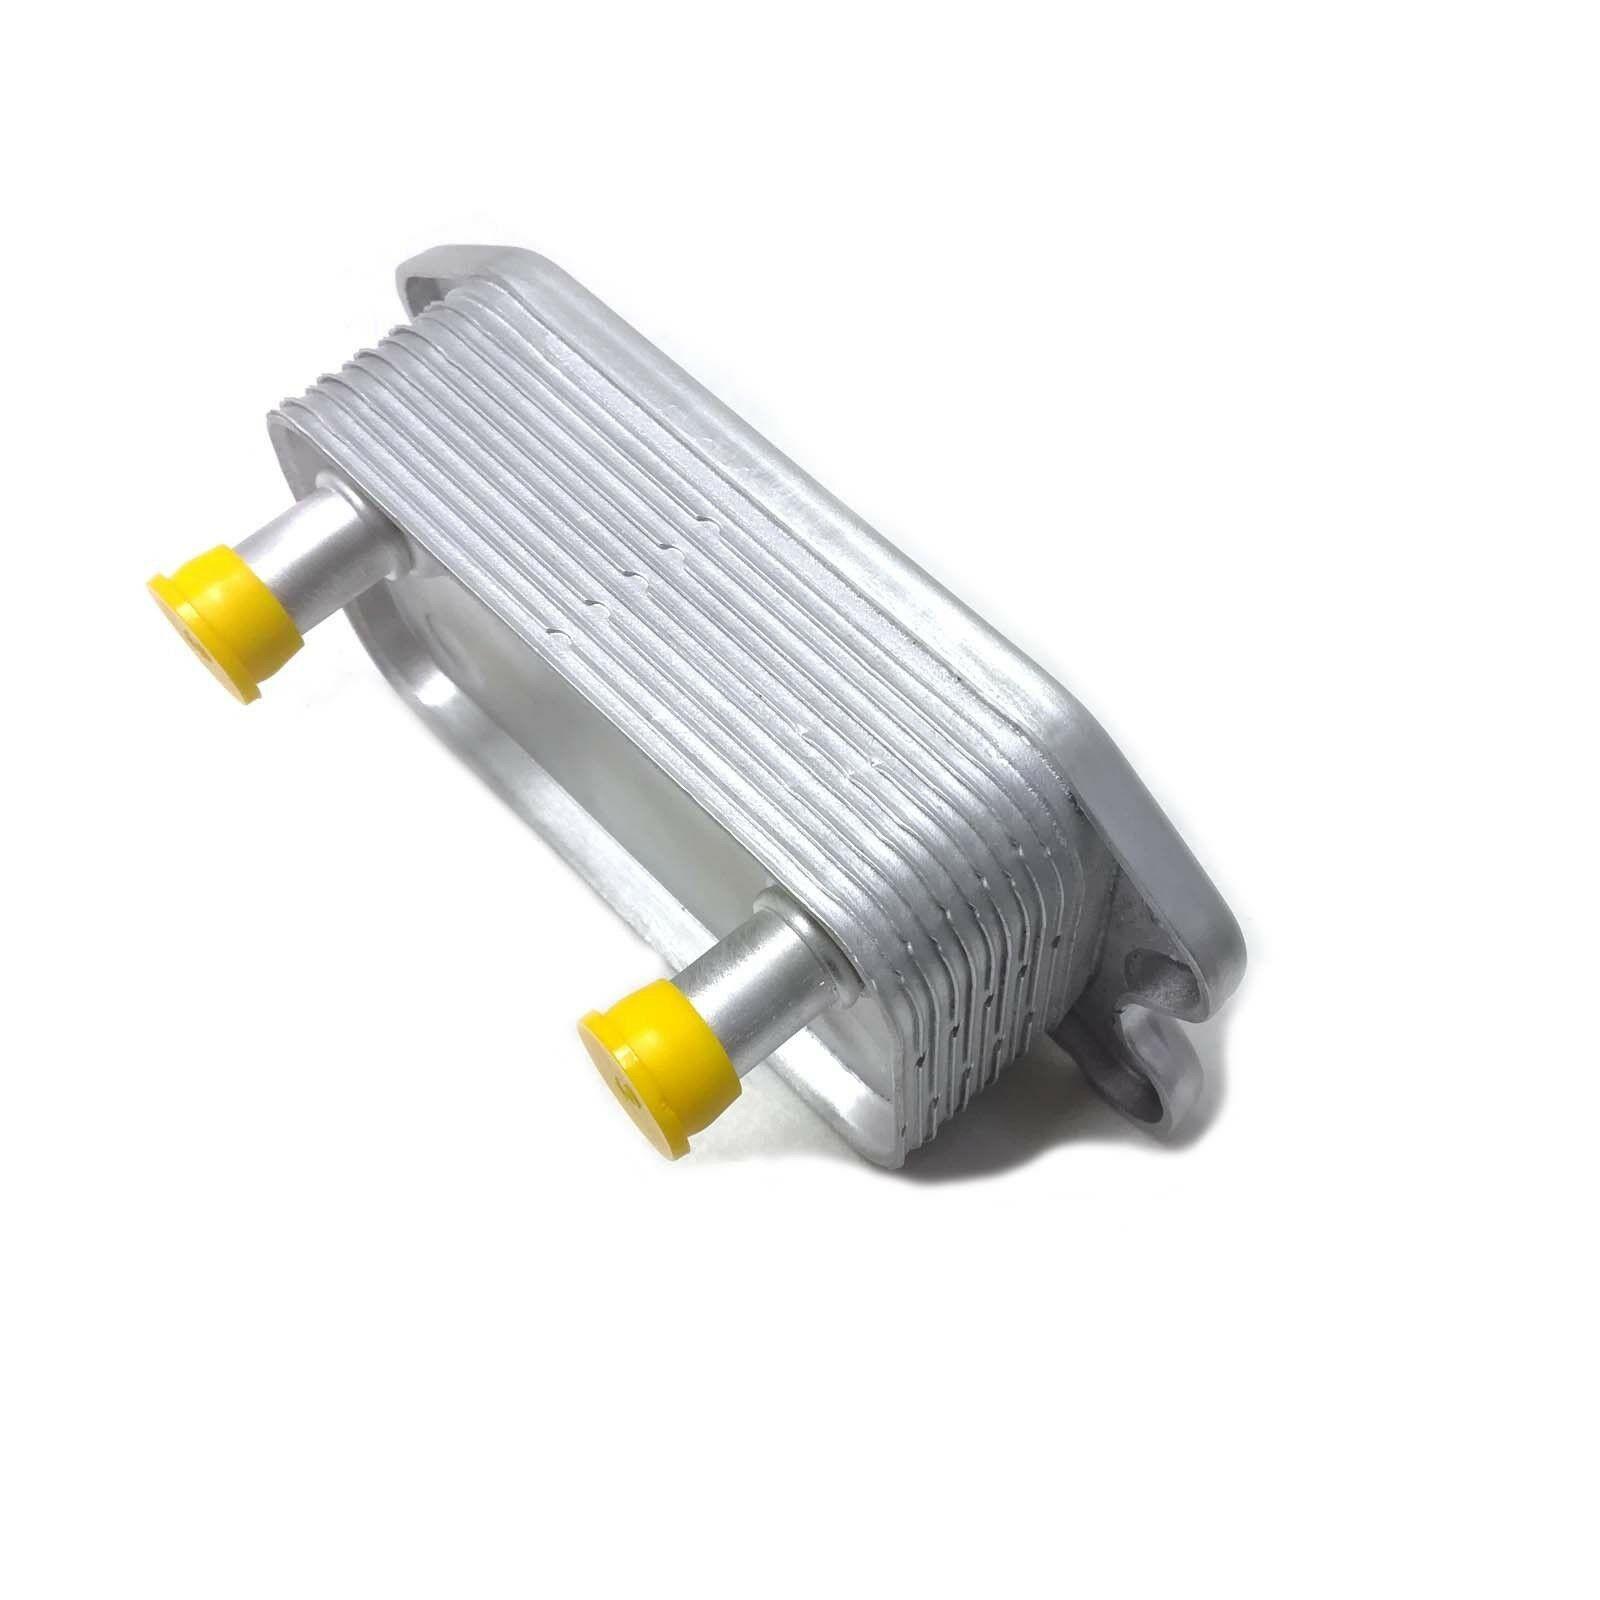 Resfriador Trocador de Calor Motor Volvo C30 2.5 T5 Turbo de 2007 à 2013 - 30637966